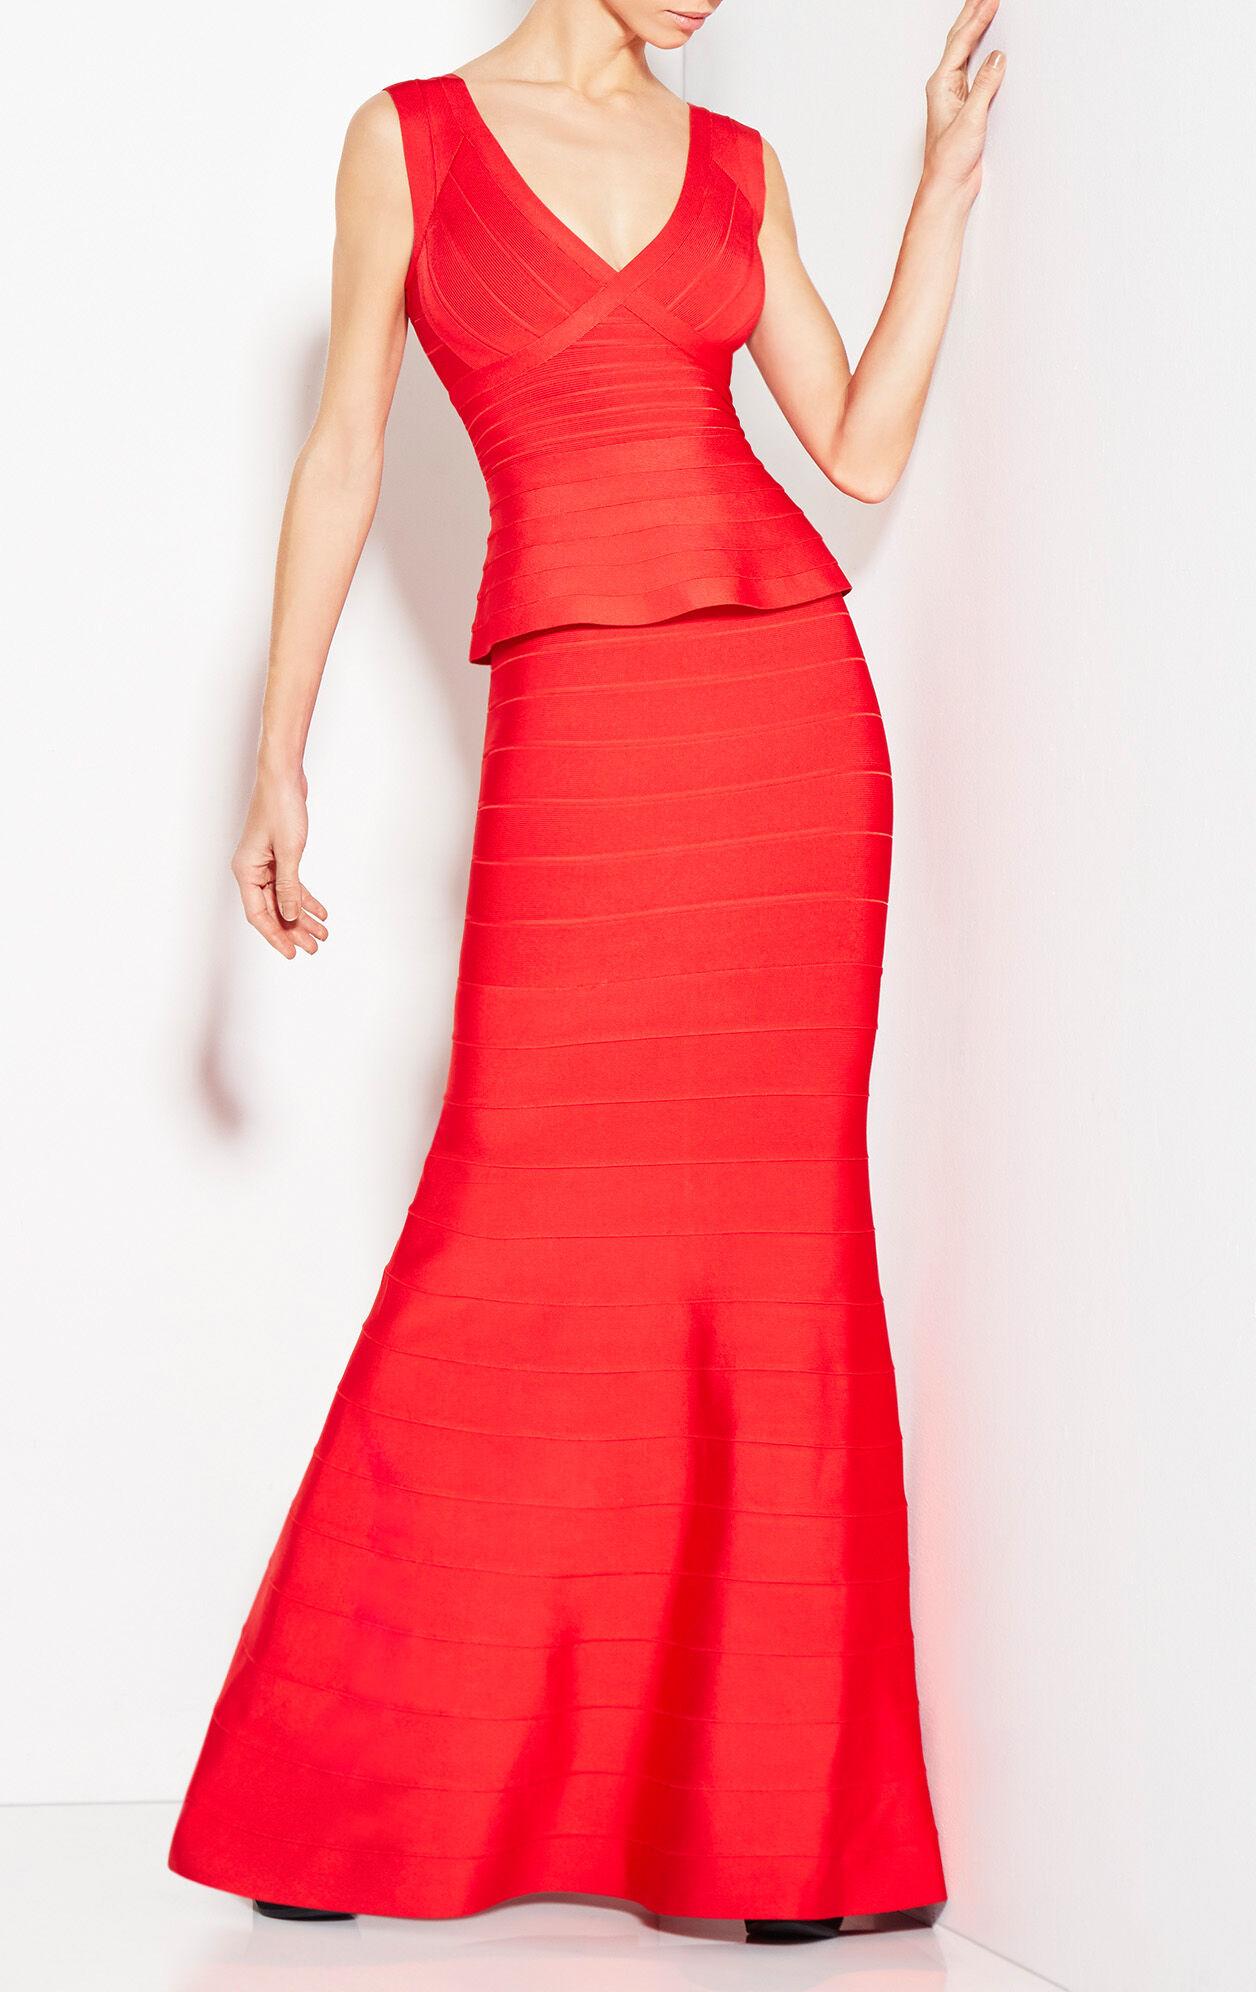 Izabela Novelty Essentials Dress